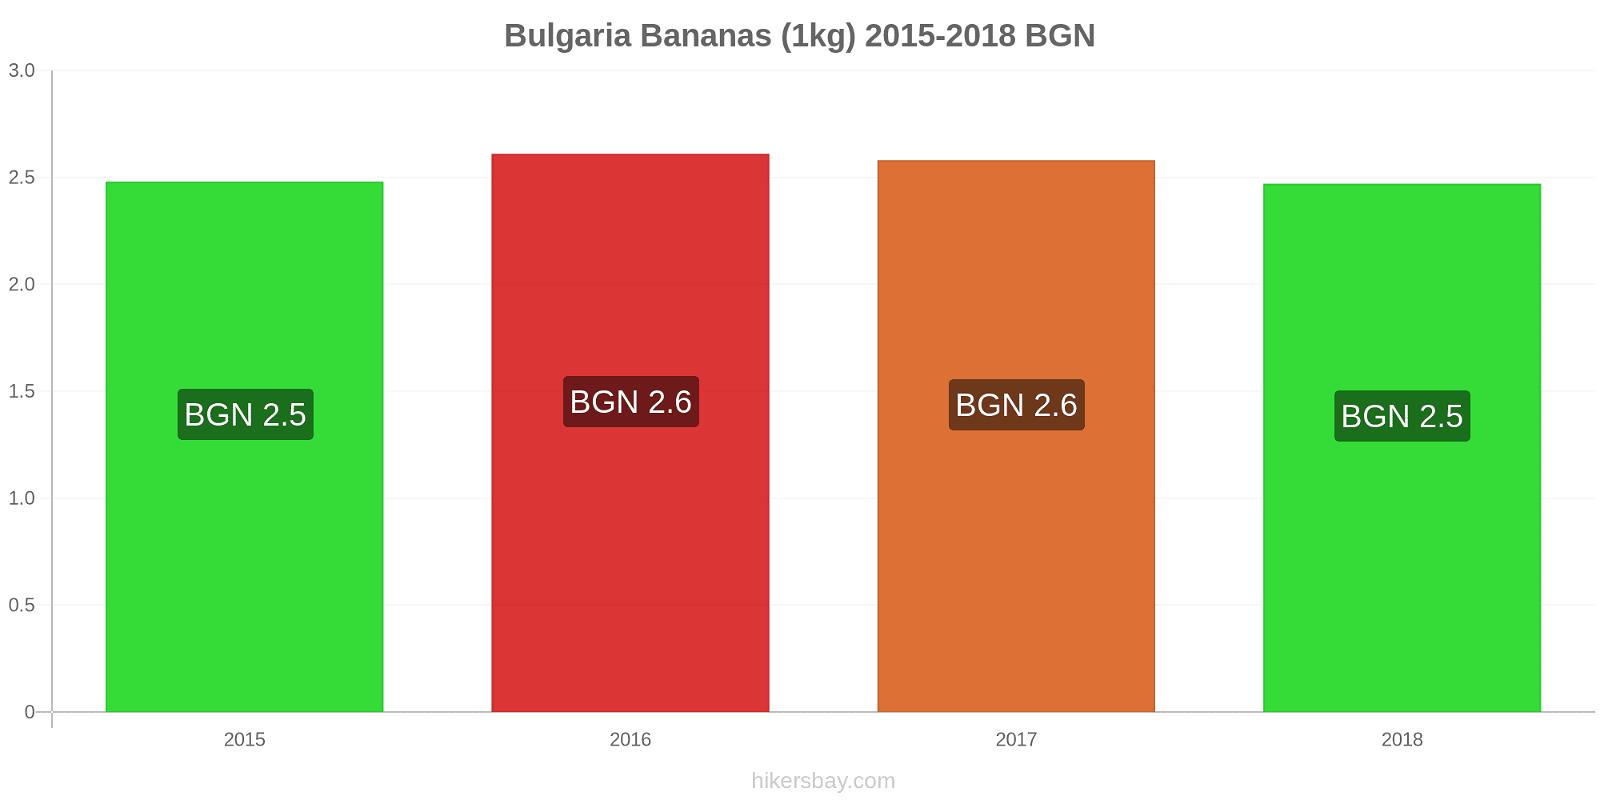 Bulgaria price changes Bananas (1kg) hikersbay.com